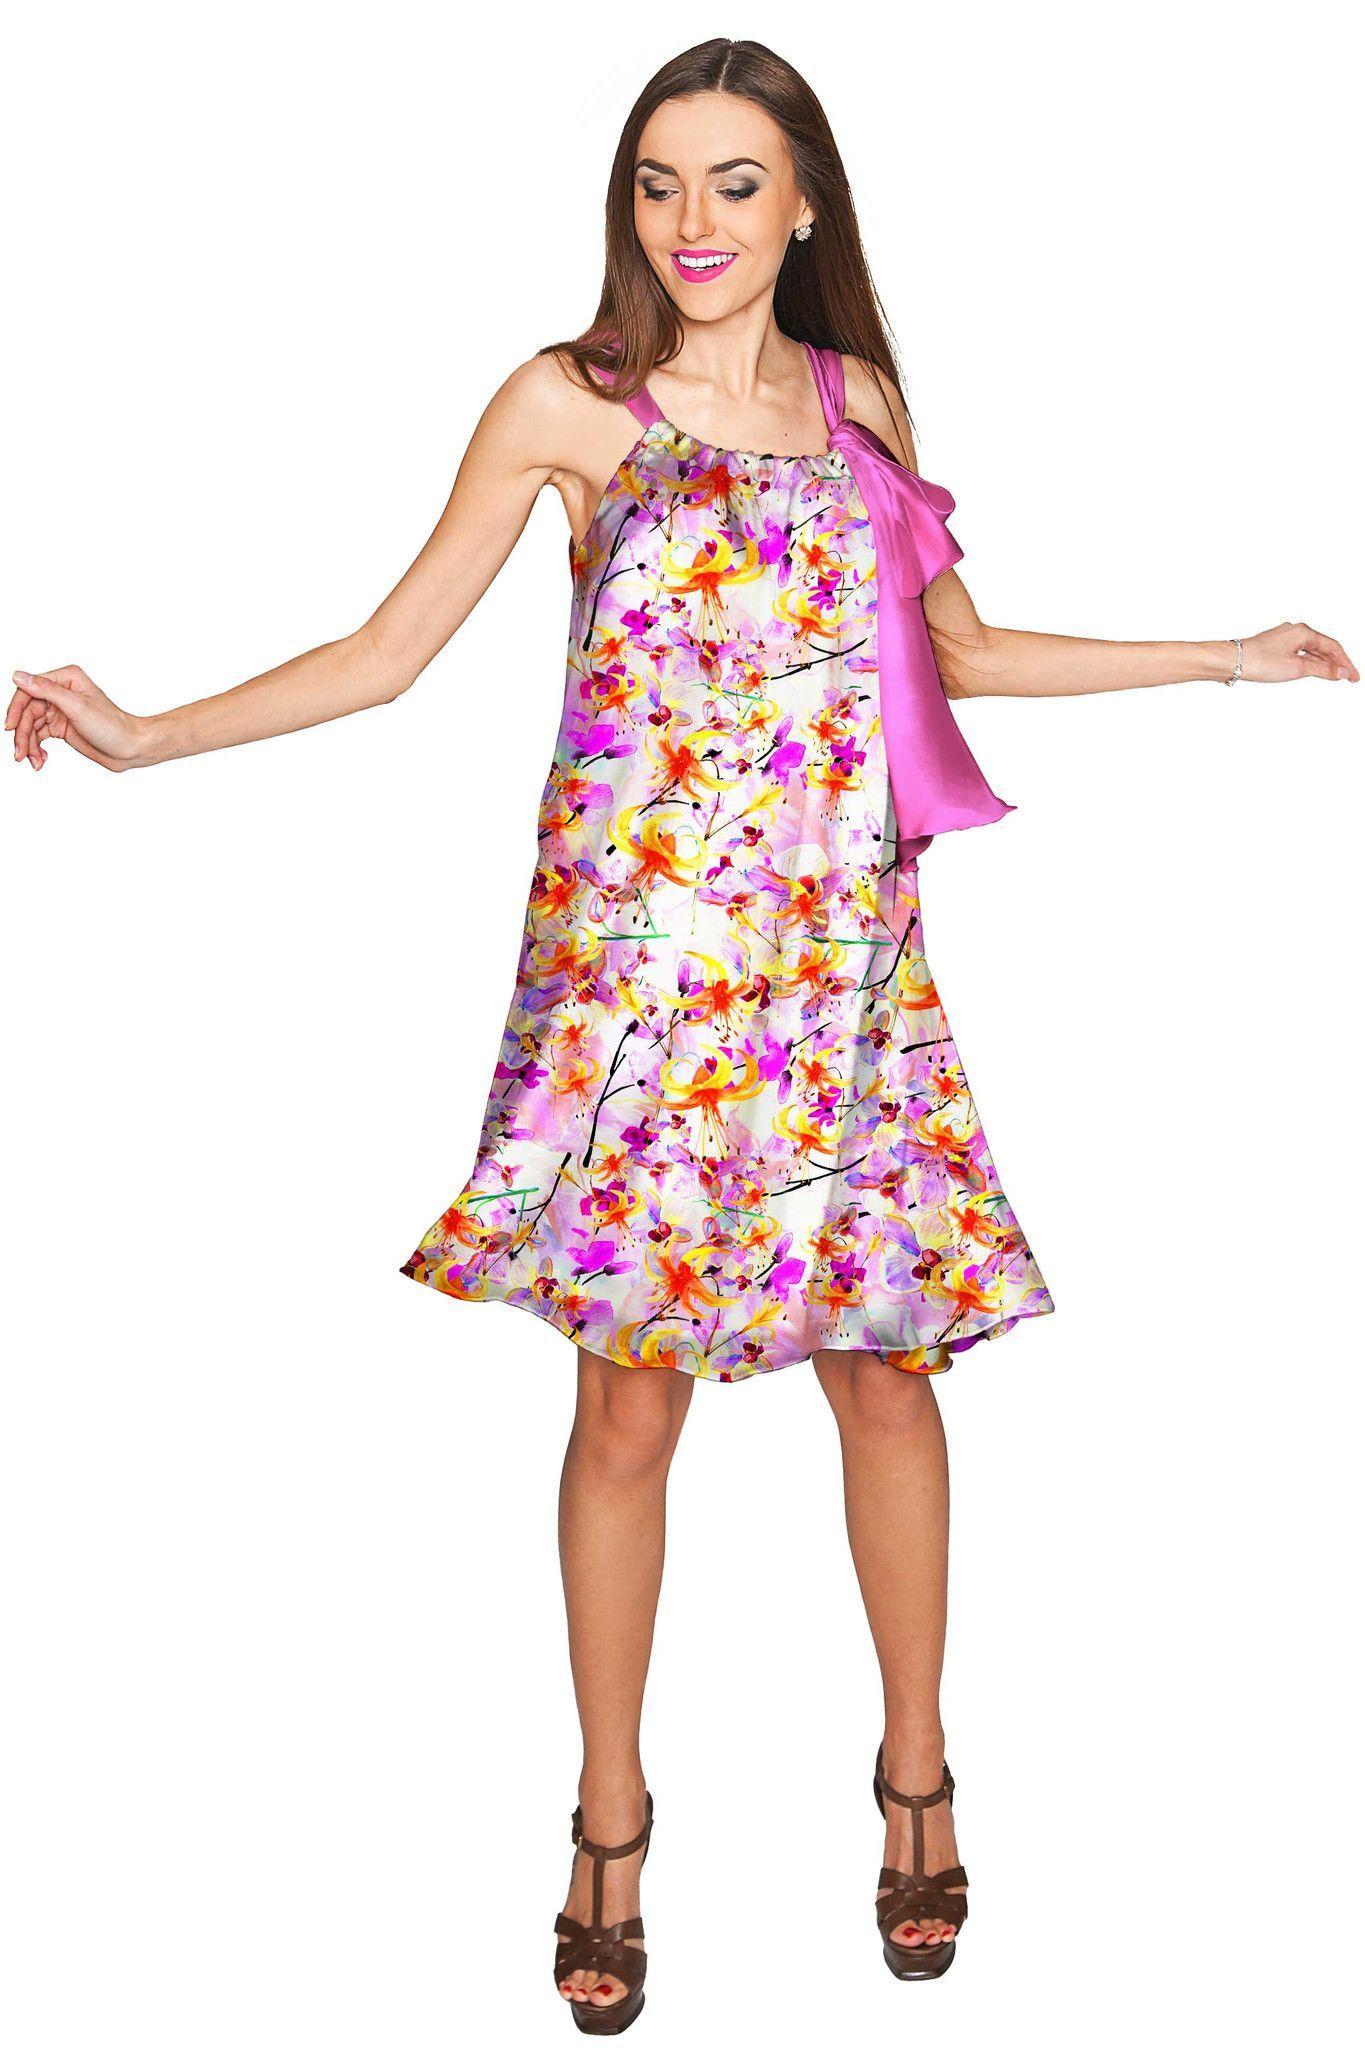 726957e39f40 In Love Melody Chiffon Dress - Women | Products